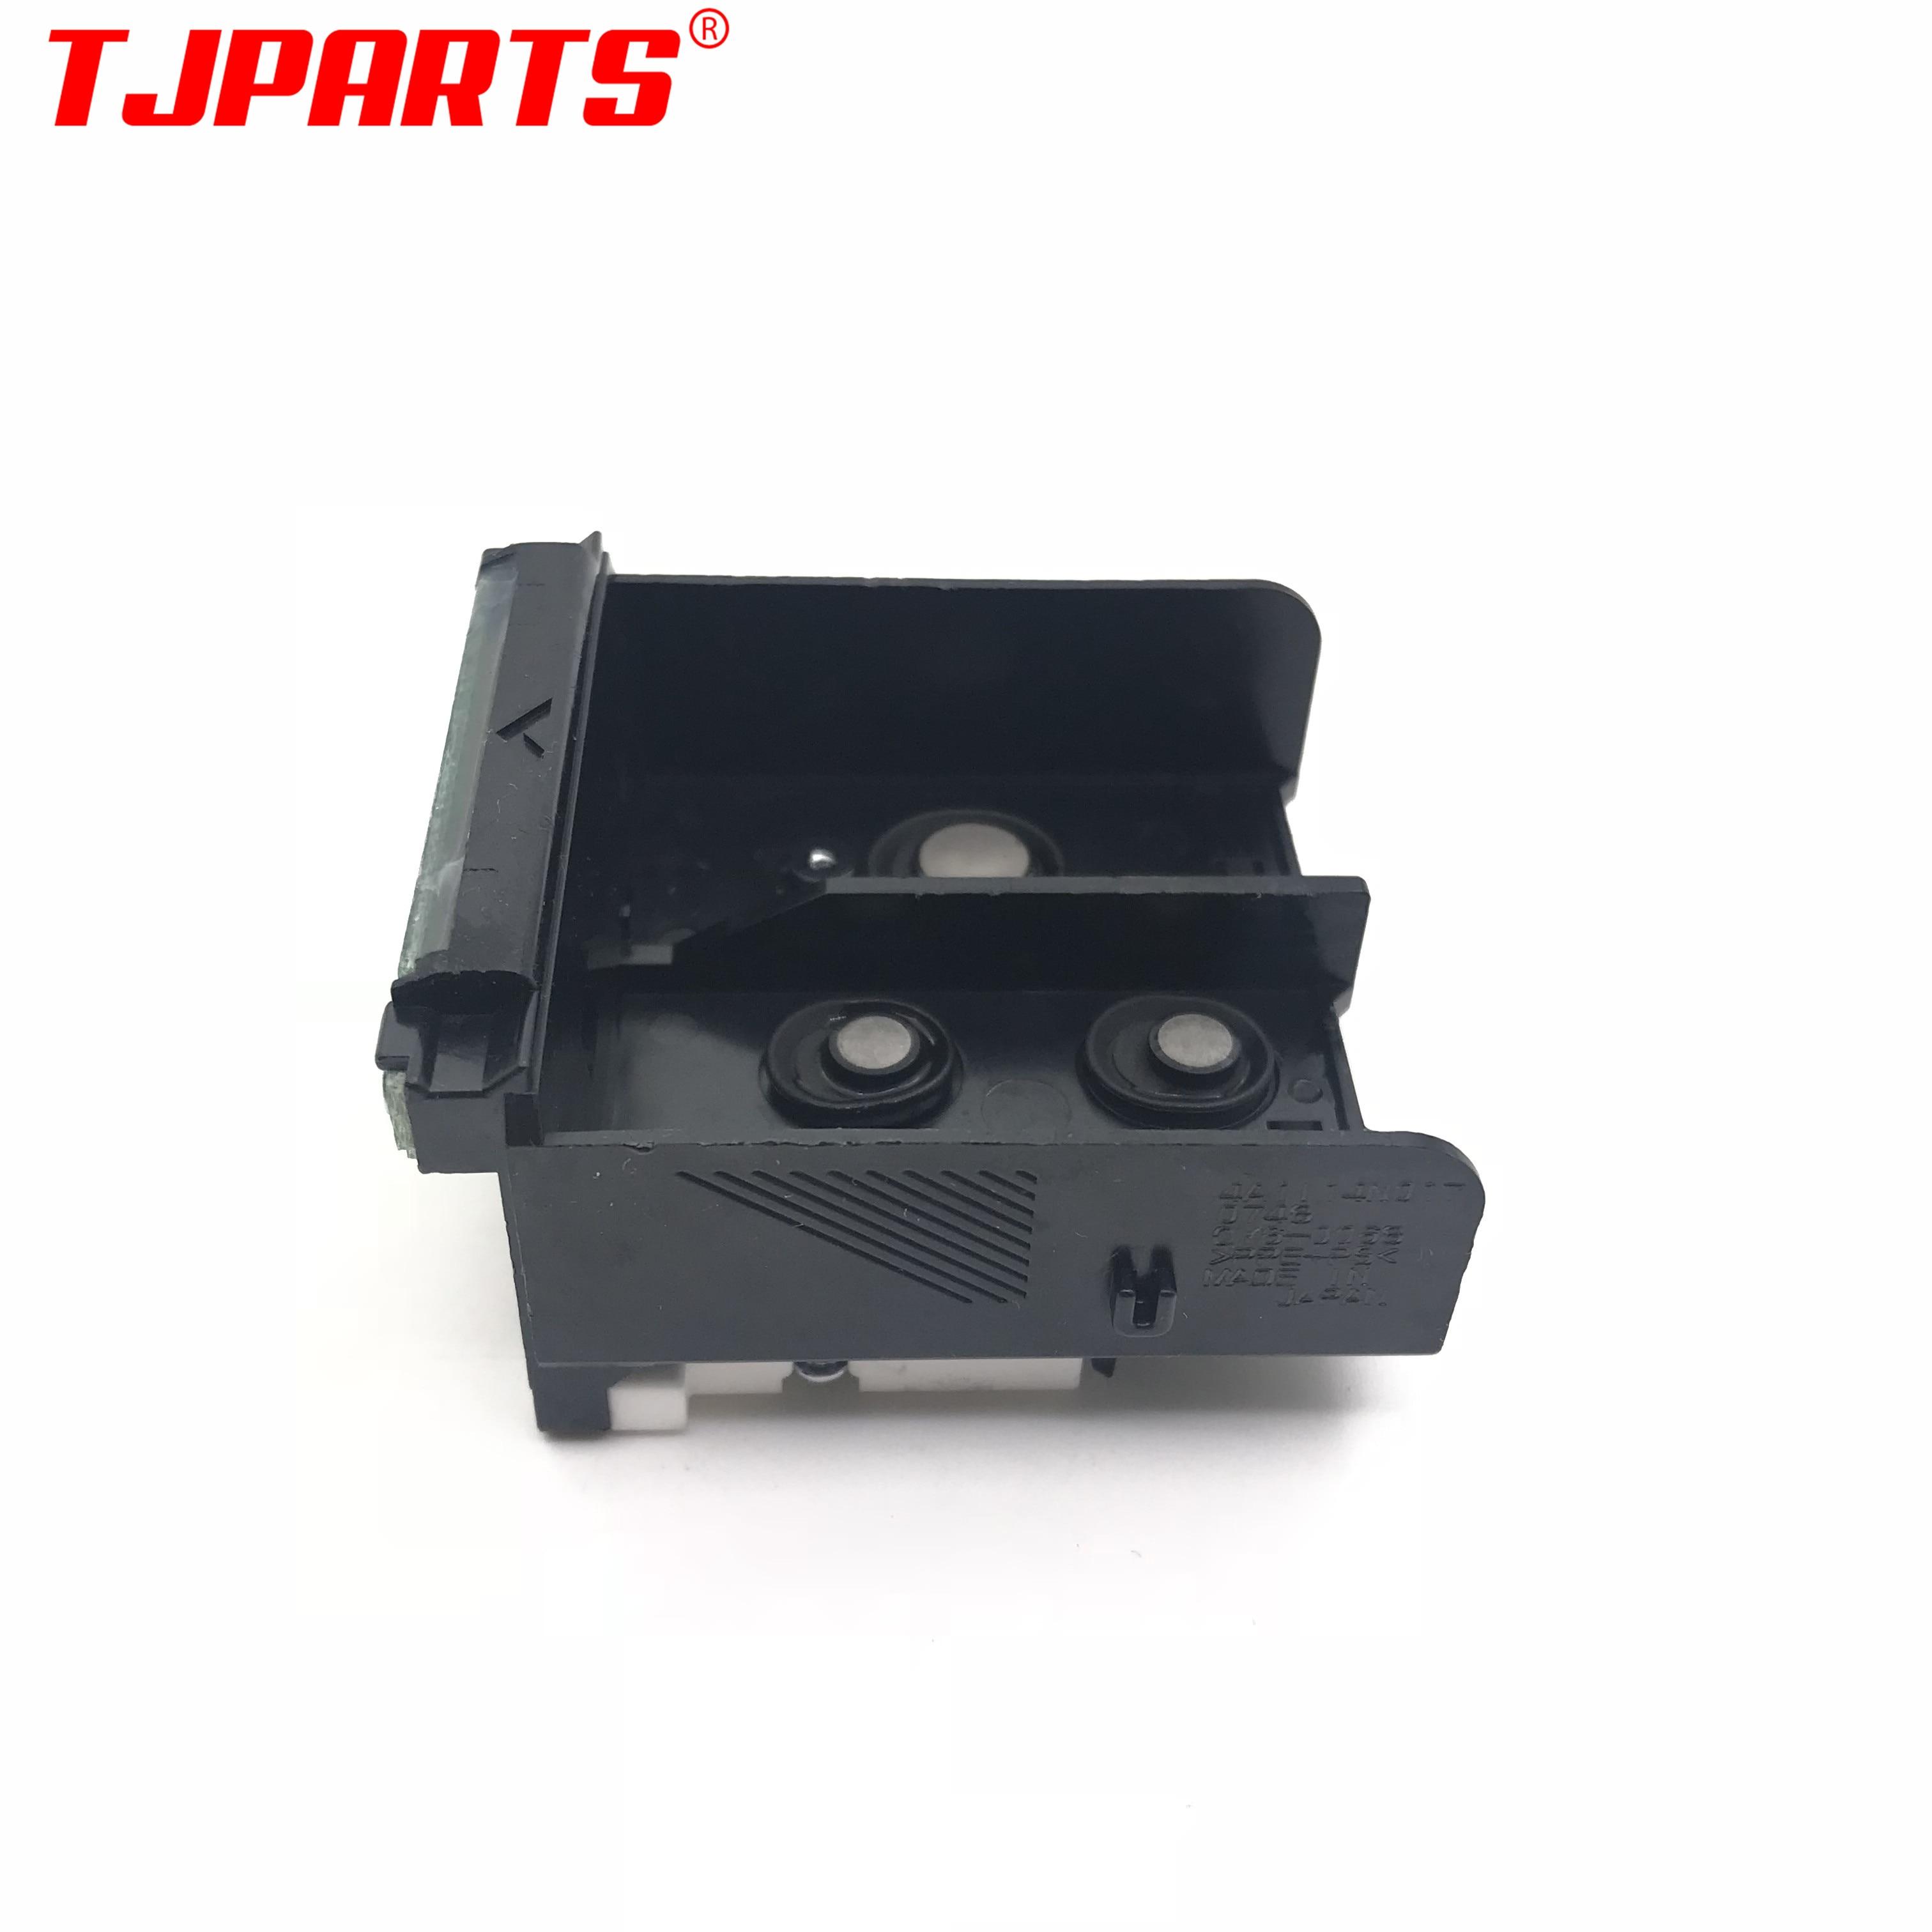 Printer Spare Parts Qy6-0068 Qy6-0068-000 Printhead Print Head Printer Head for Canon Pixma Ip100